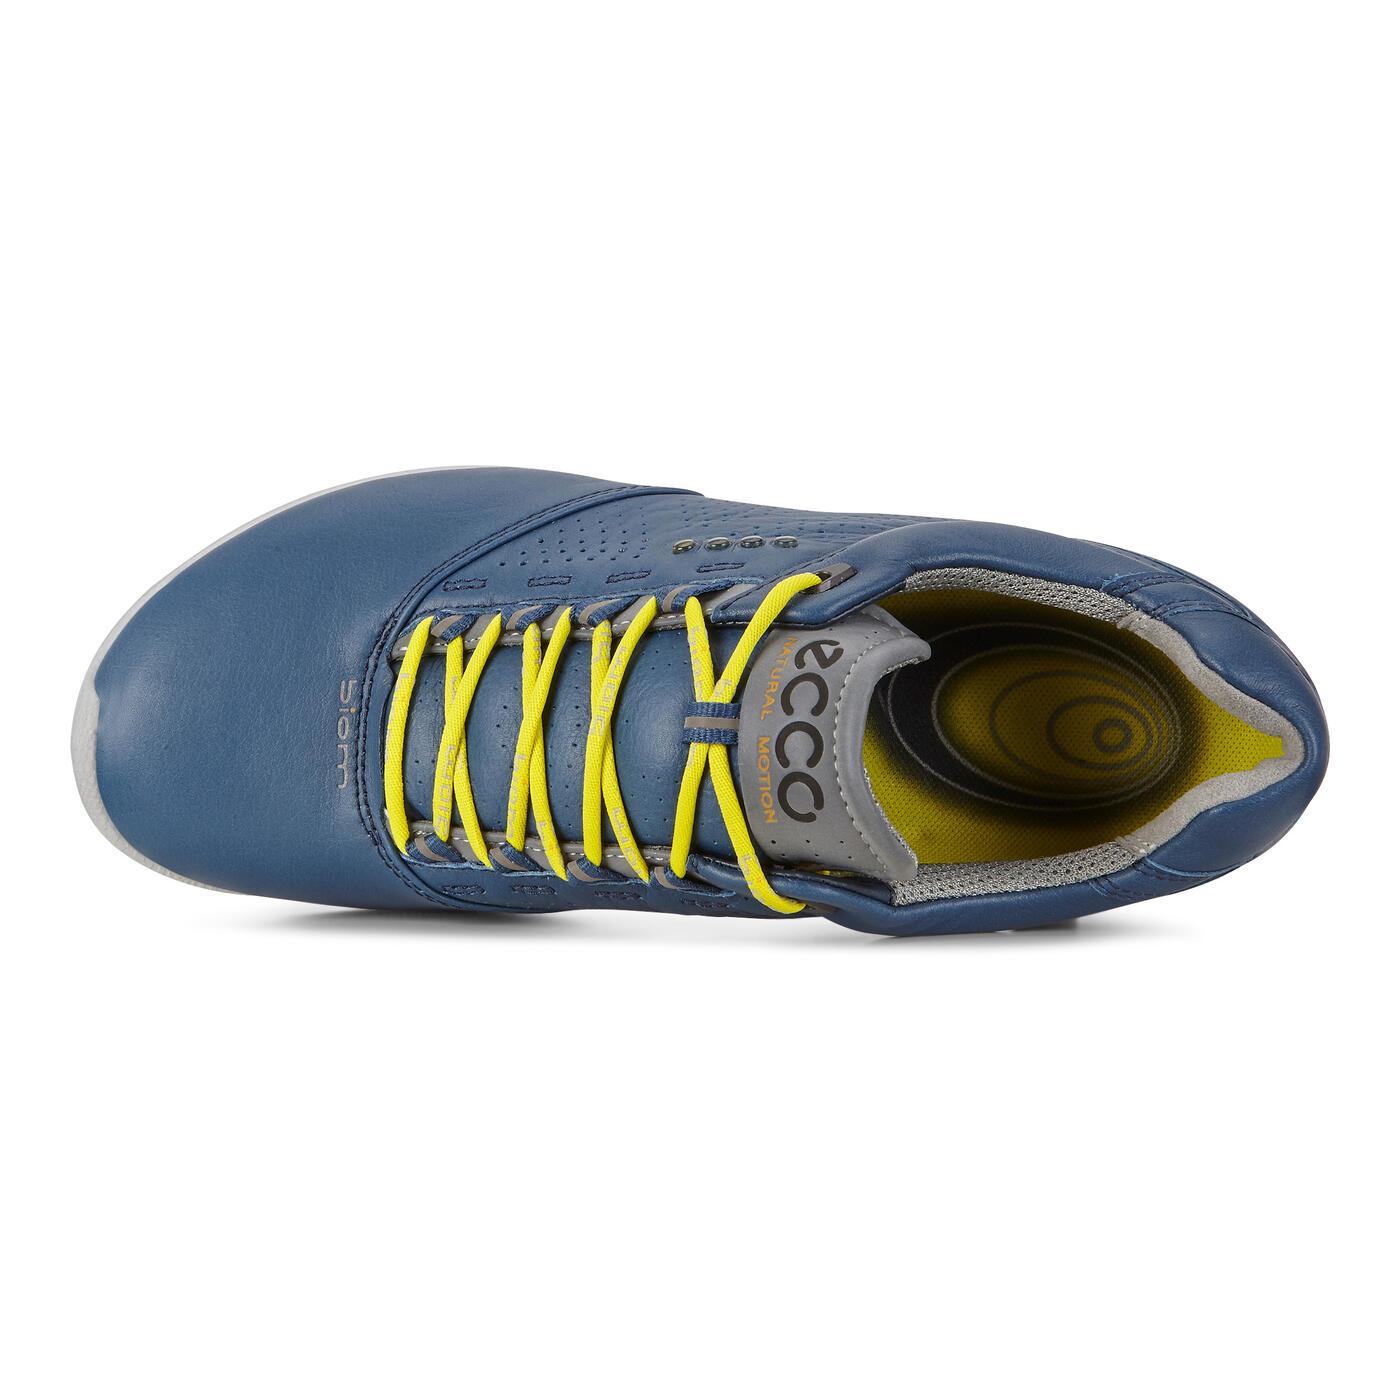 ECCO BIOM HYBRID 2 Men's Shoe